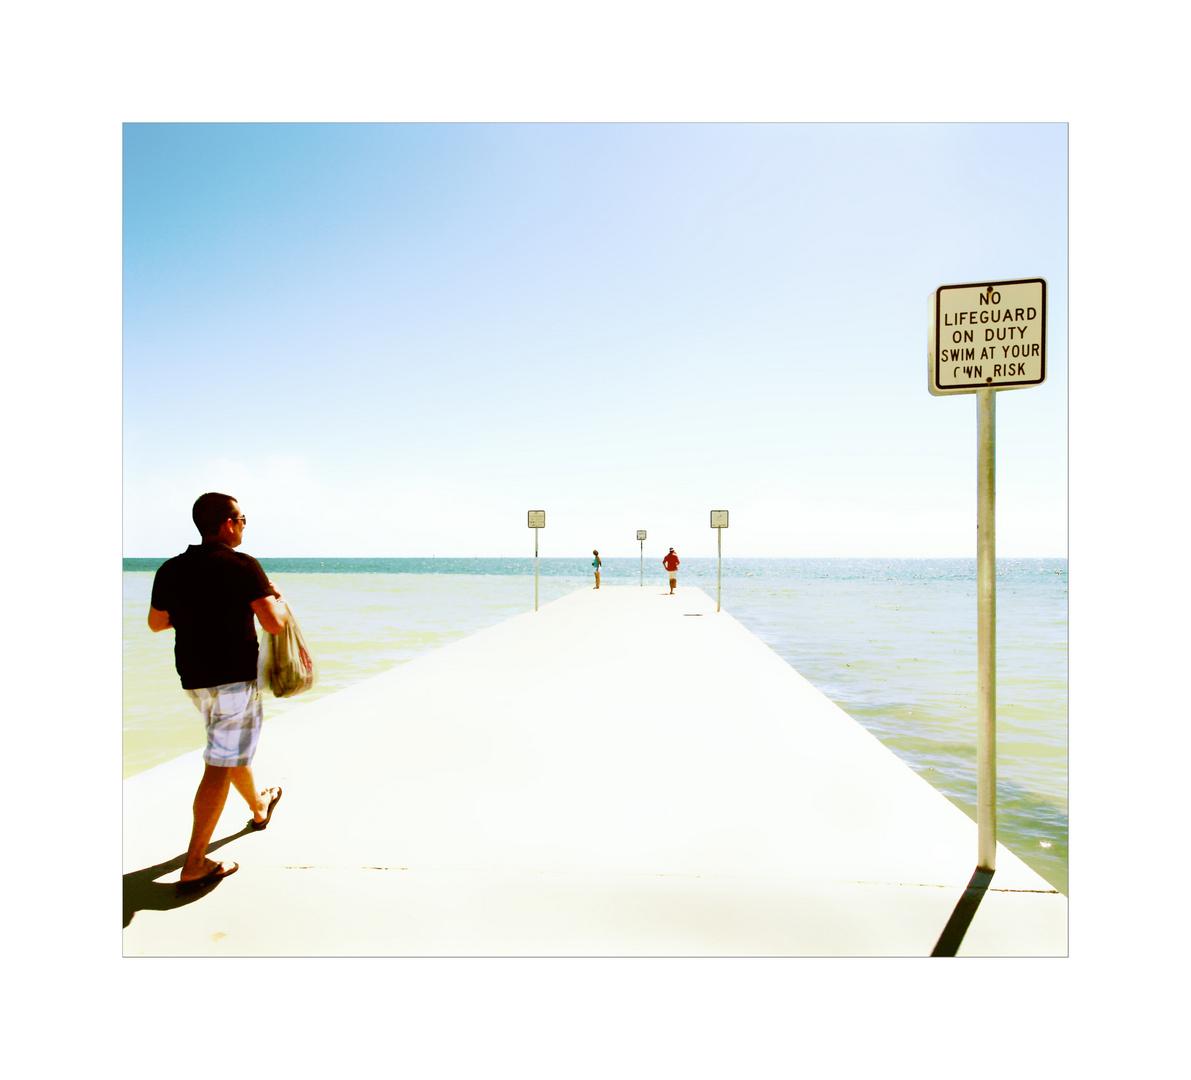 TomCatwalk-- florida check my brain